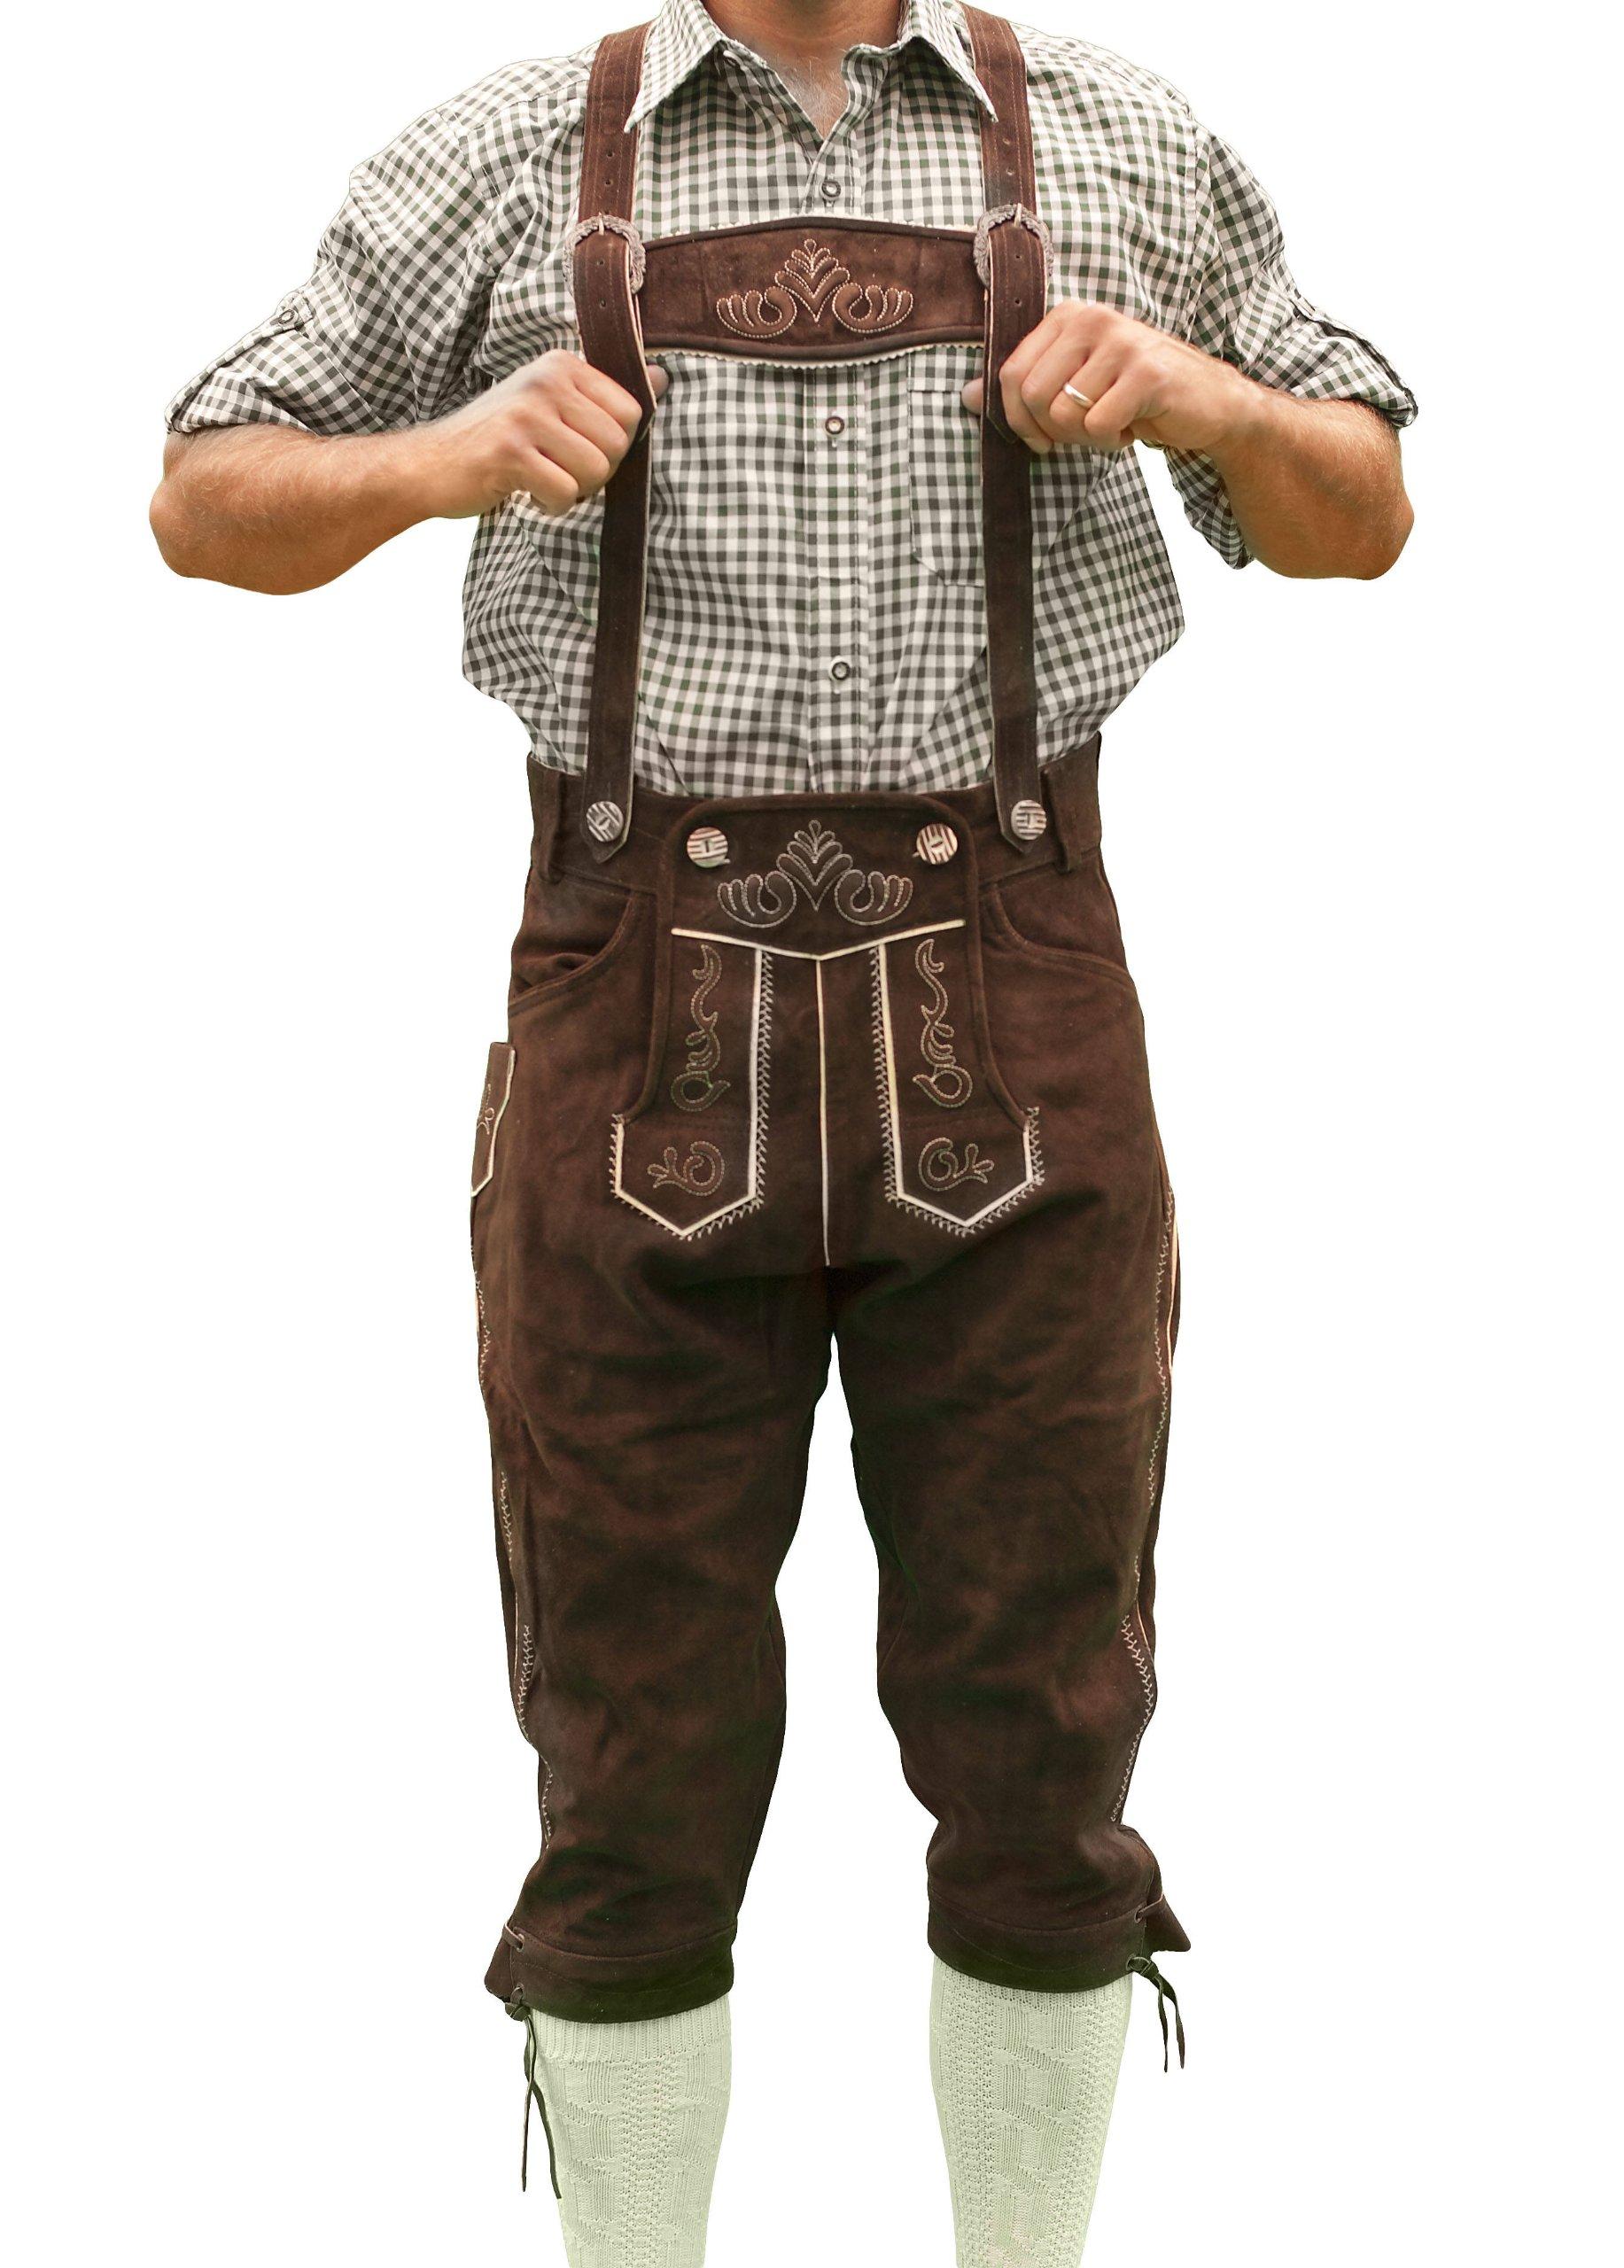 Bavarian Tracht Lederhosen HANS, Bavarian Clothing - 42 - Dark brown